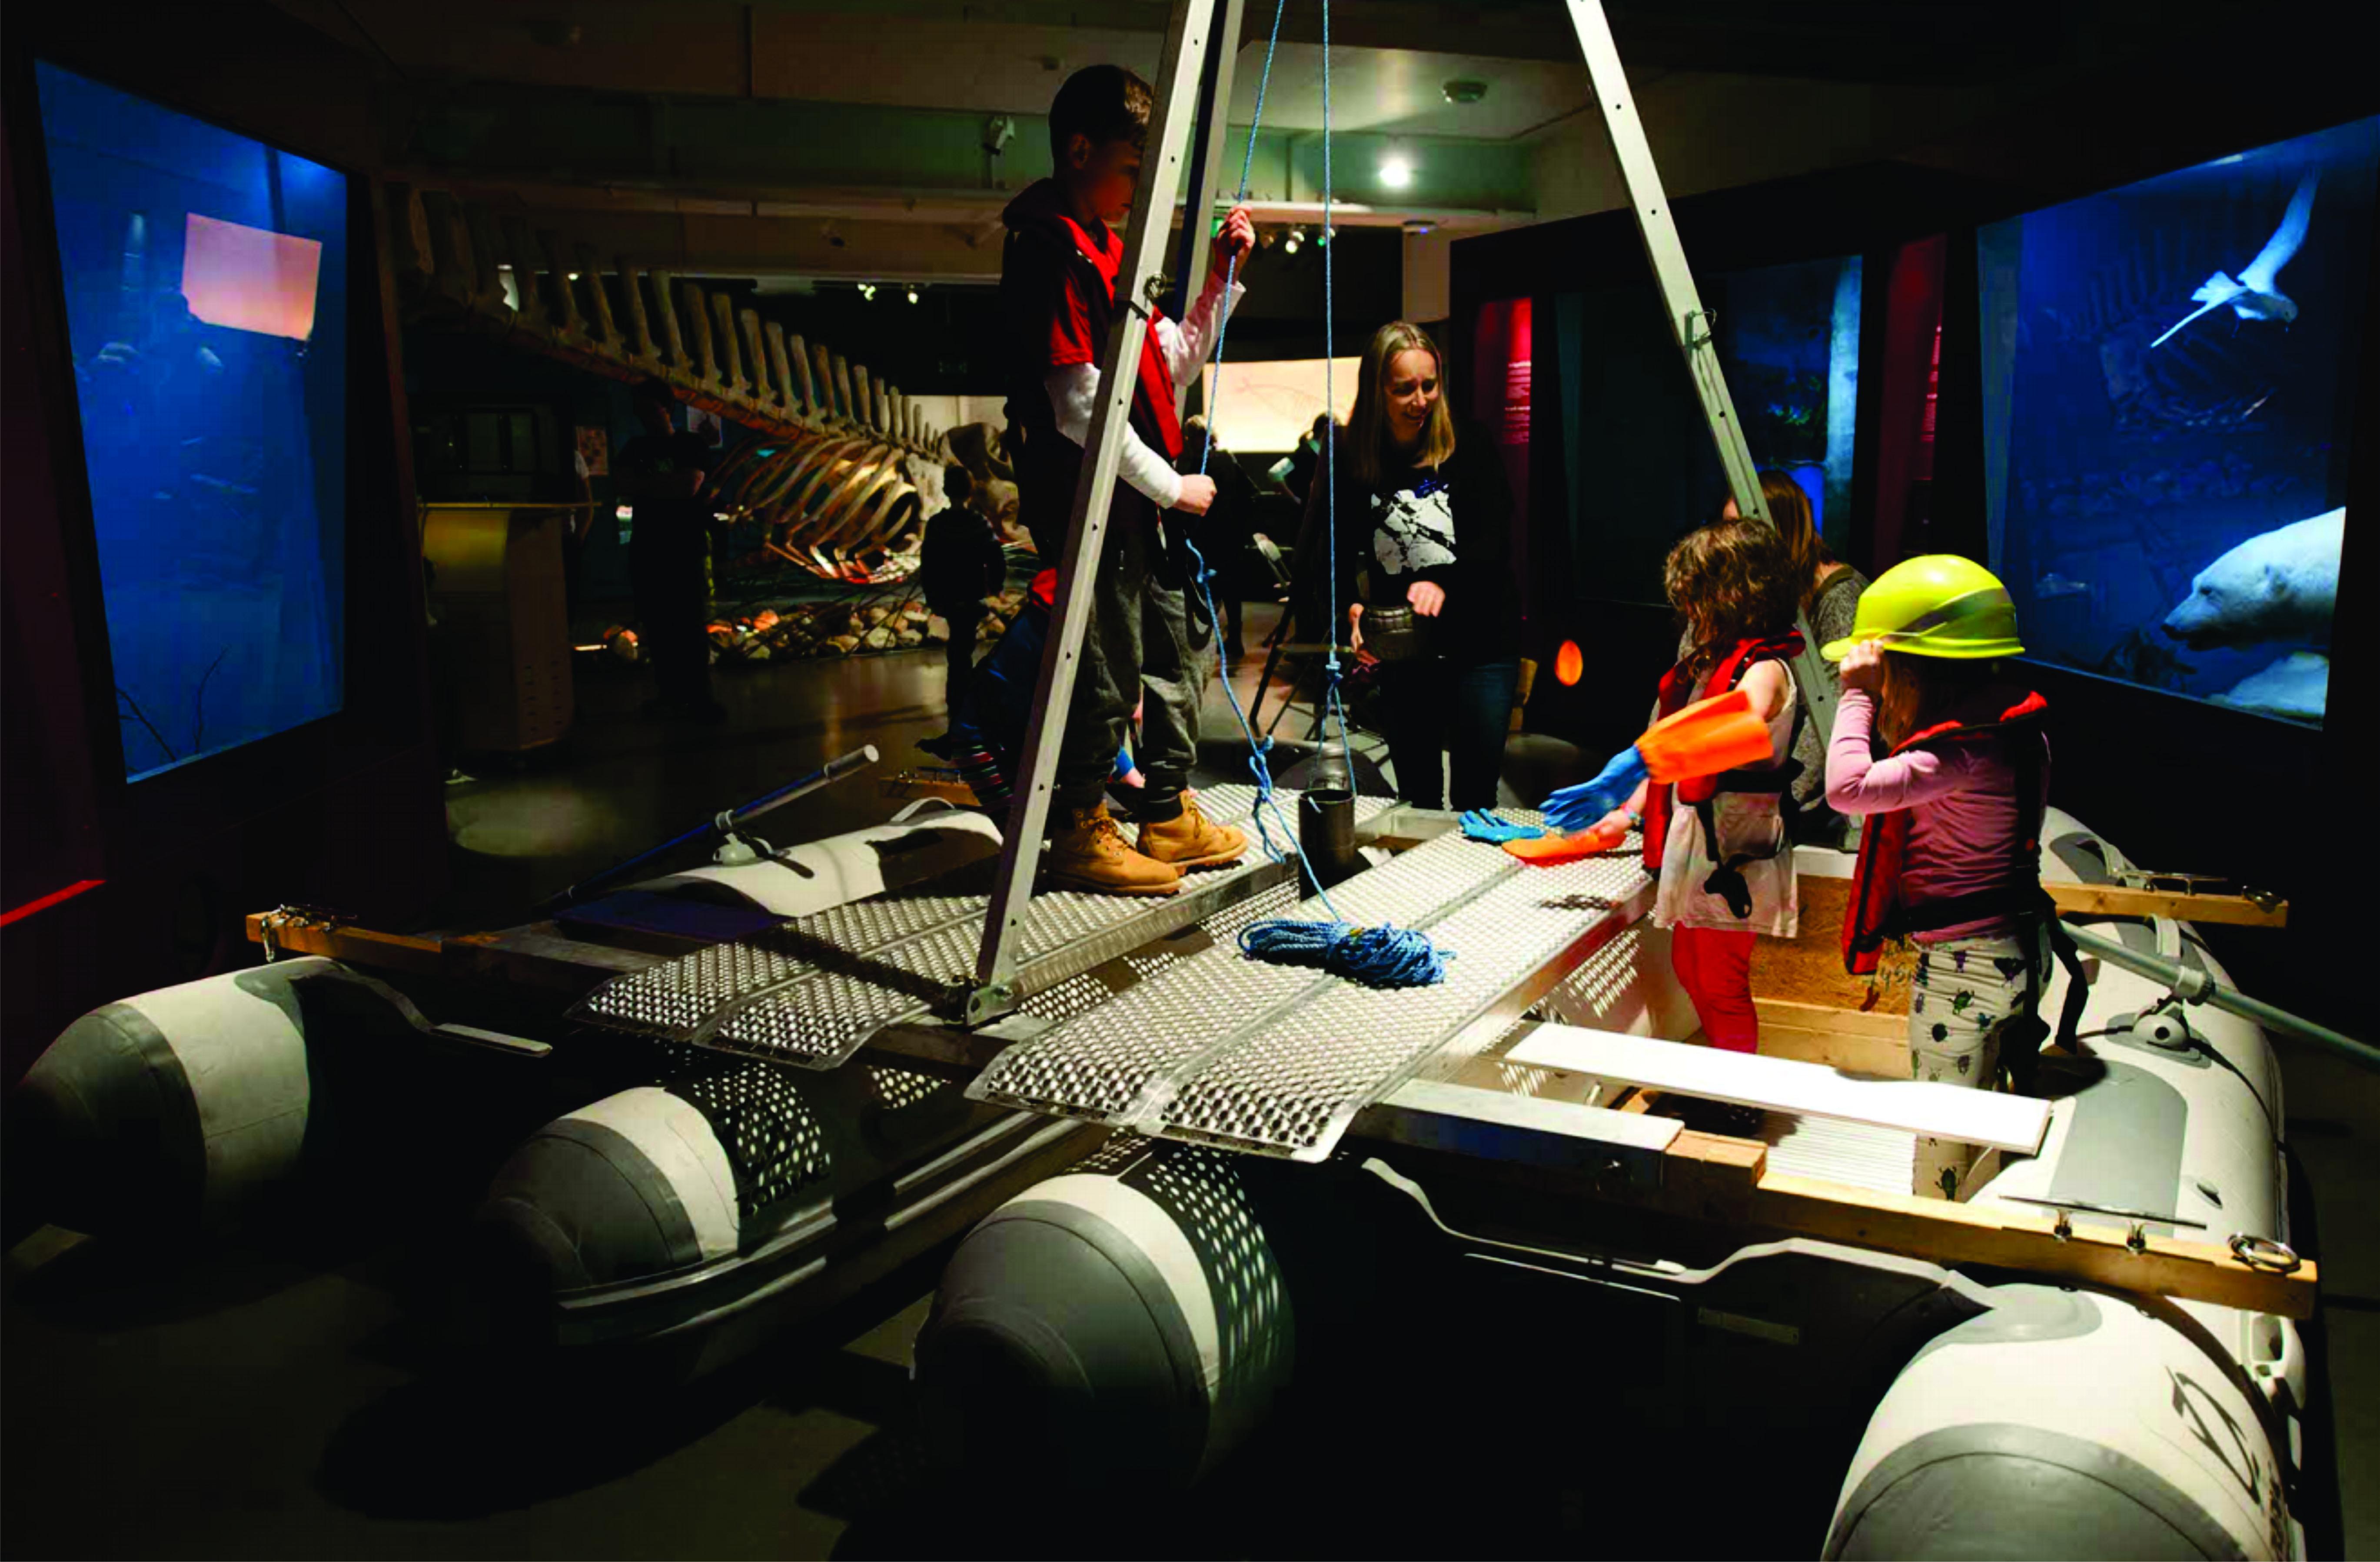 Desembernatt in Tromsø Museum